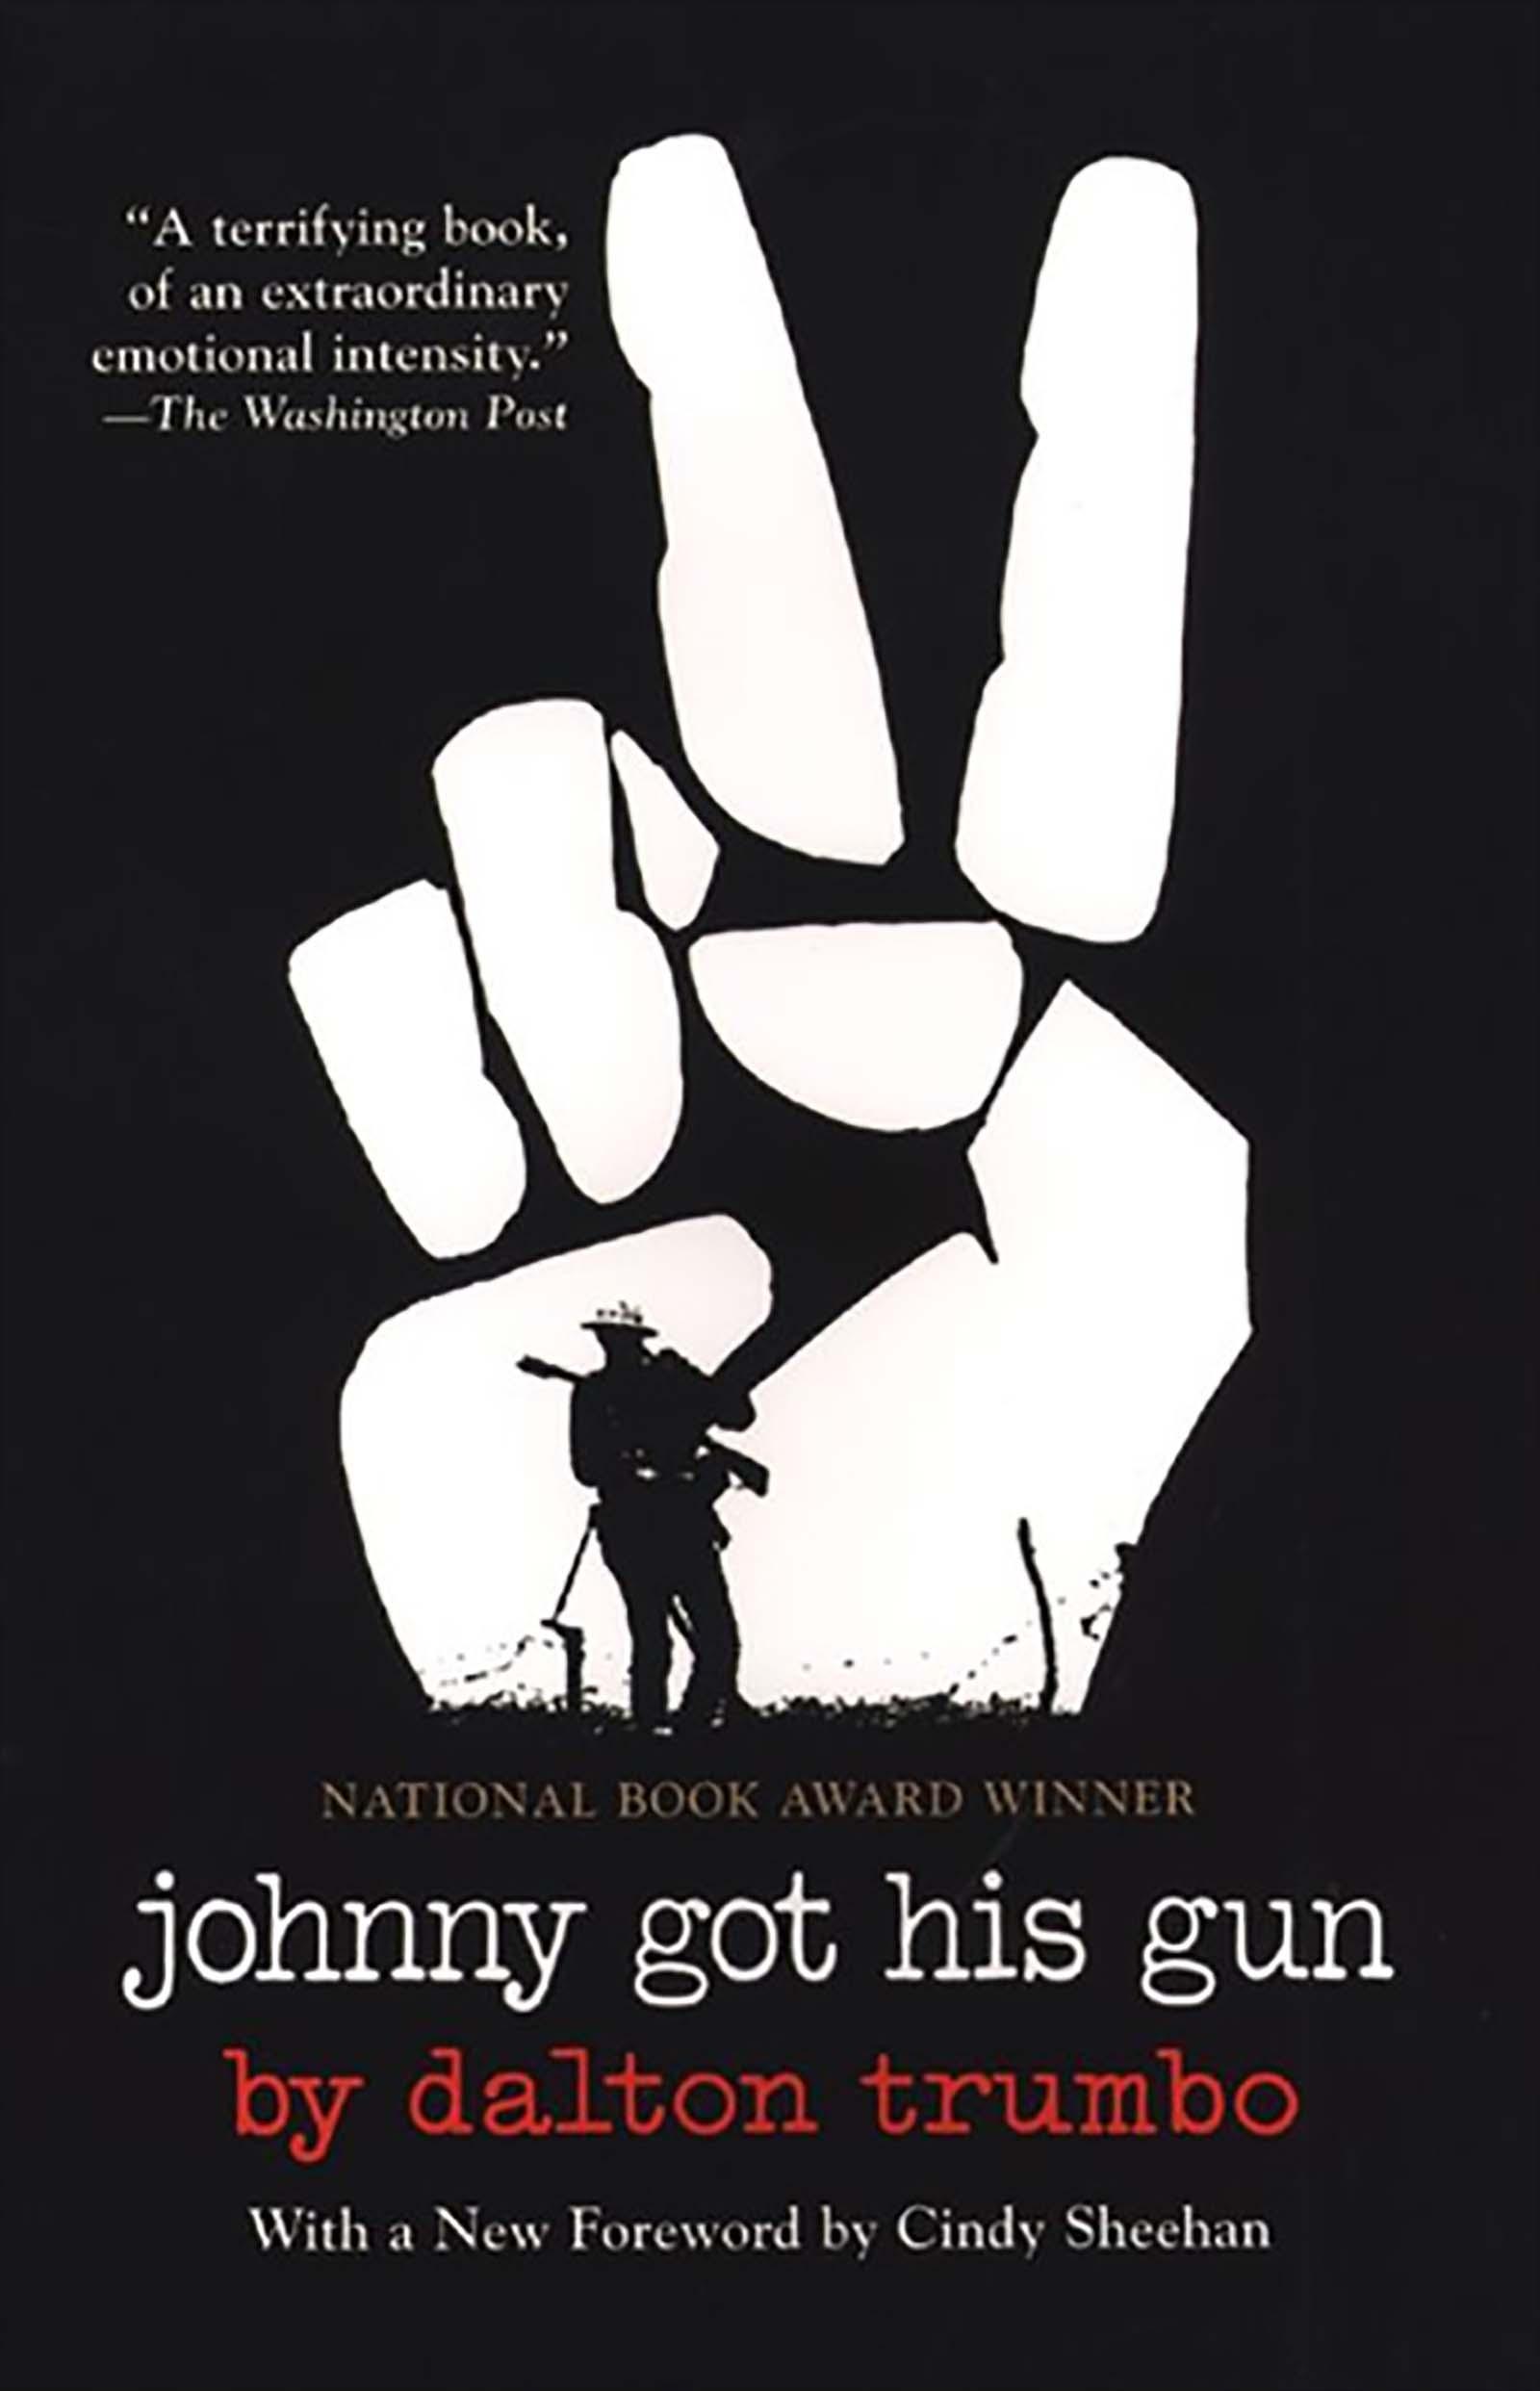 Johnny got his gun cover image